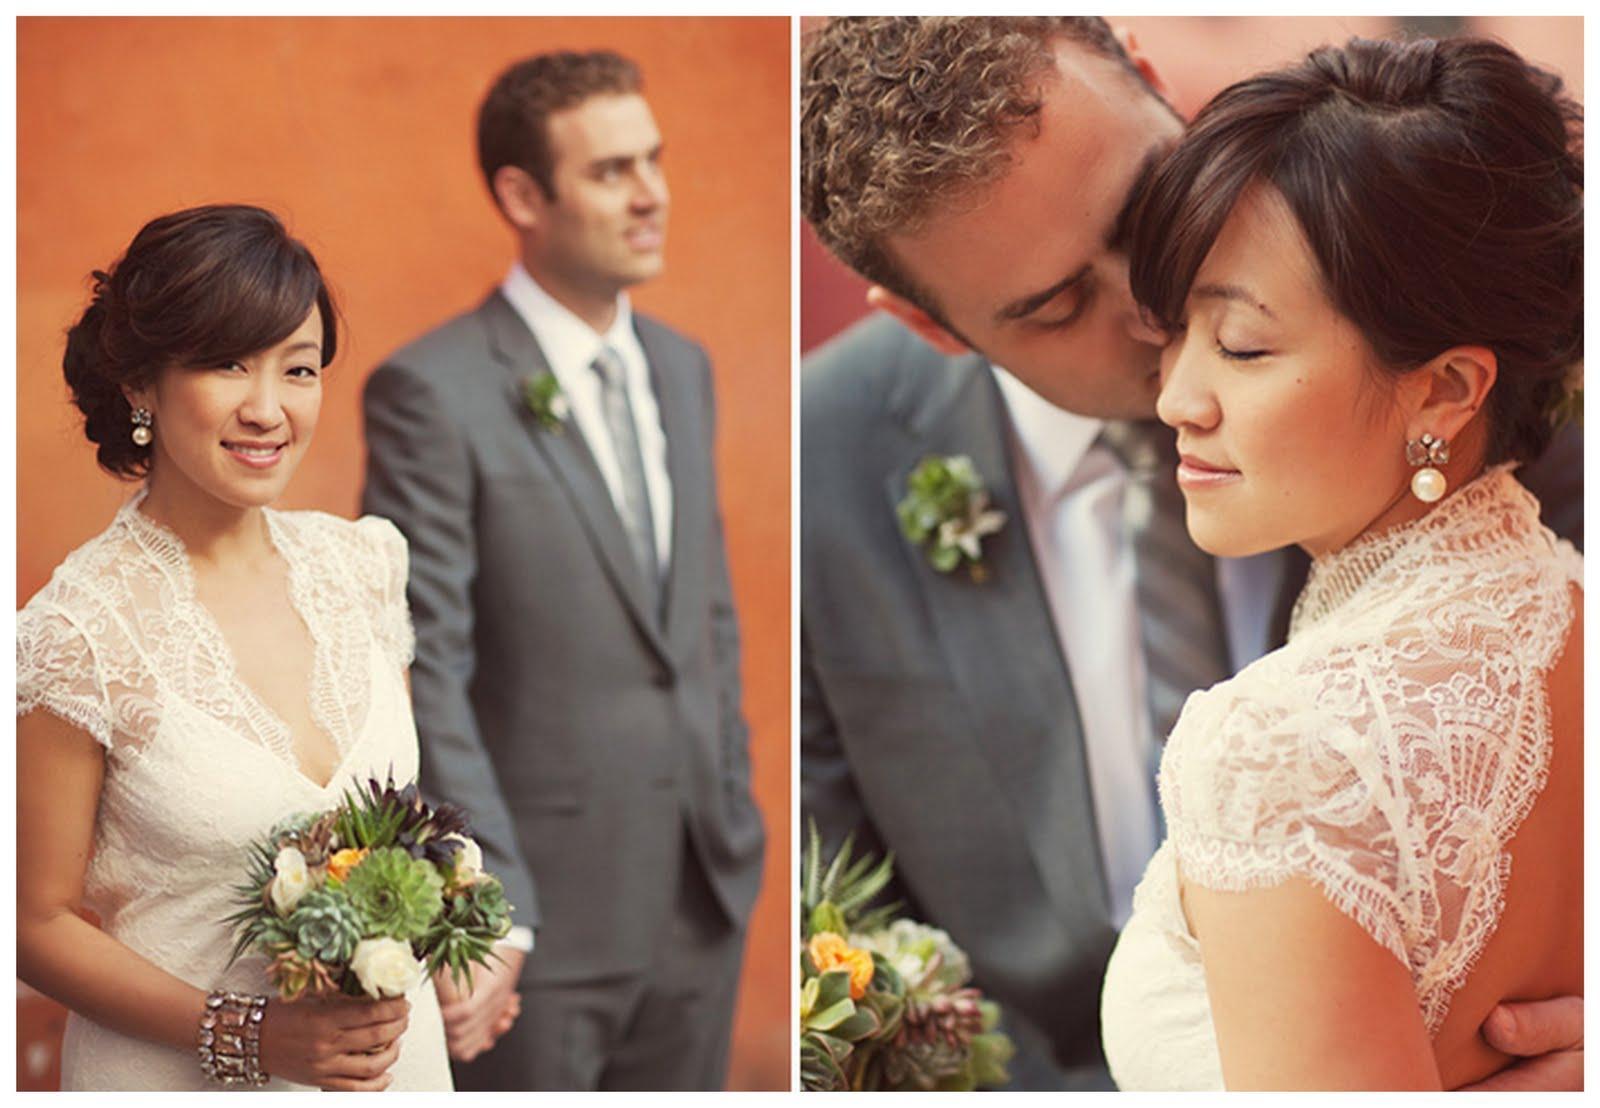 BOYS WEDDING PROM PAGEBOY NAVY